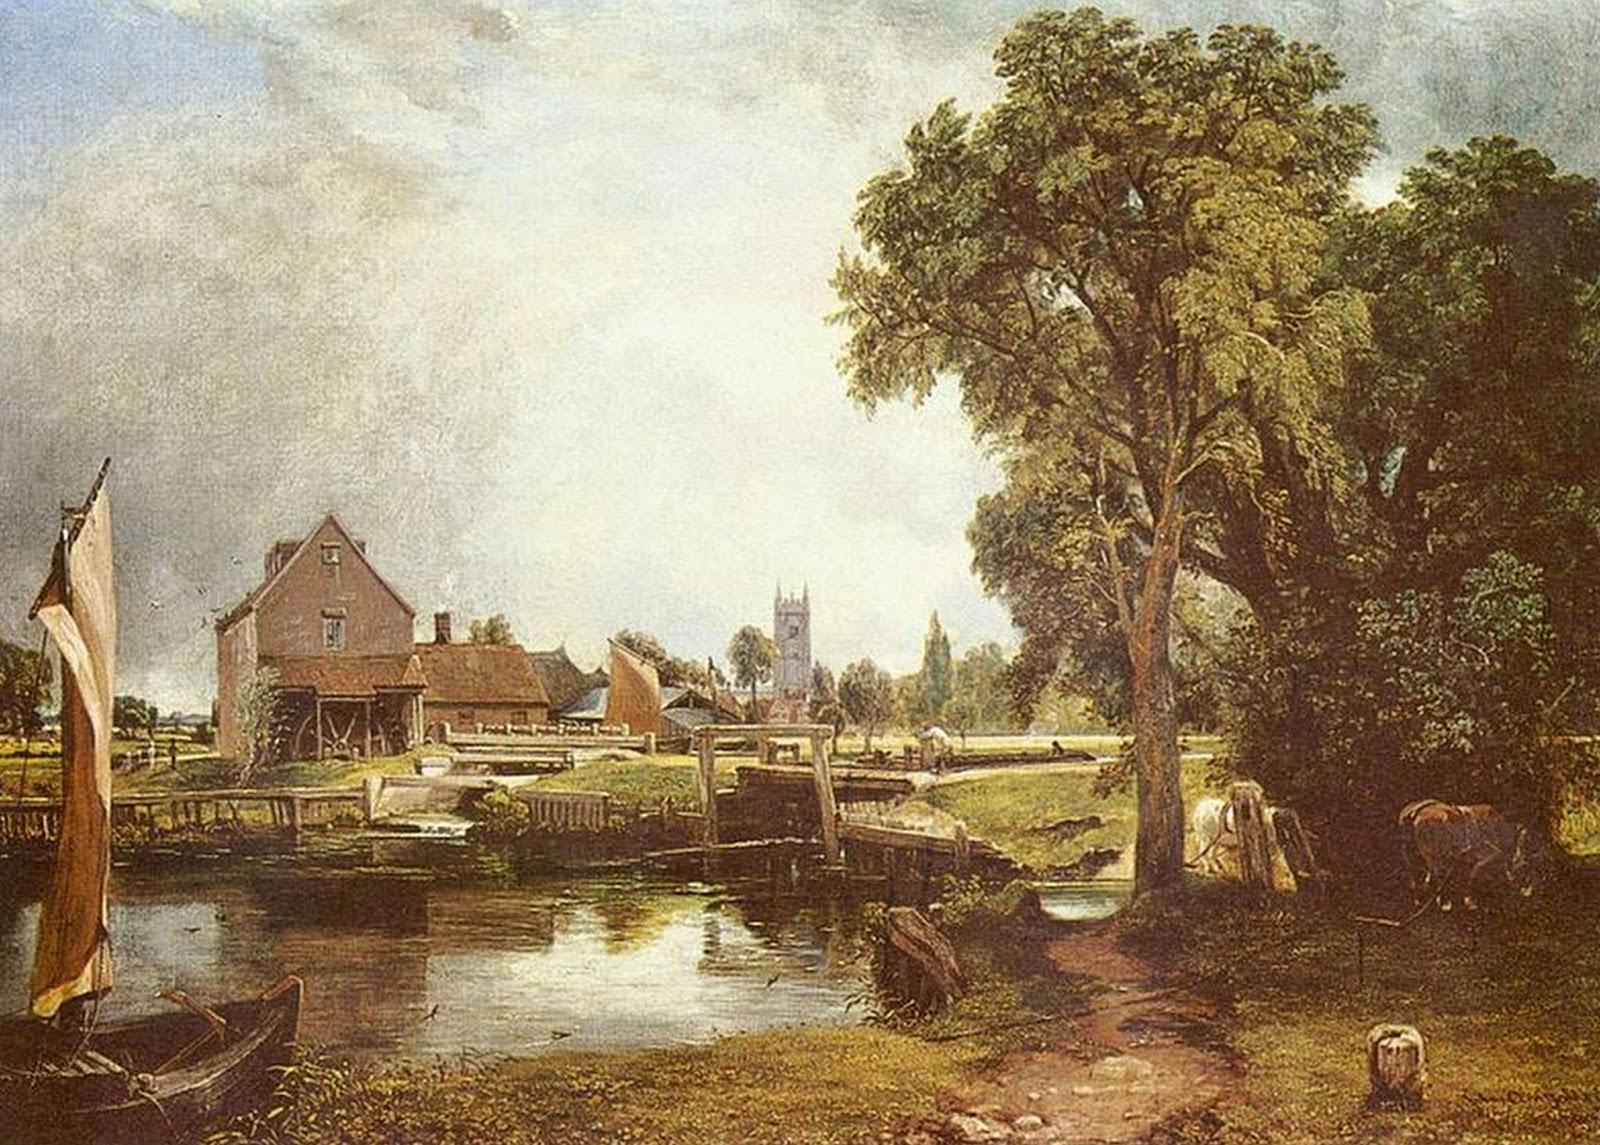 paisajes-clasicos-campesinos-de-Europa-cuadros-al-oleo